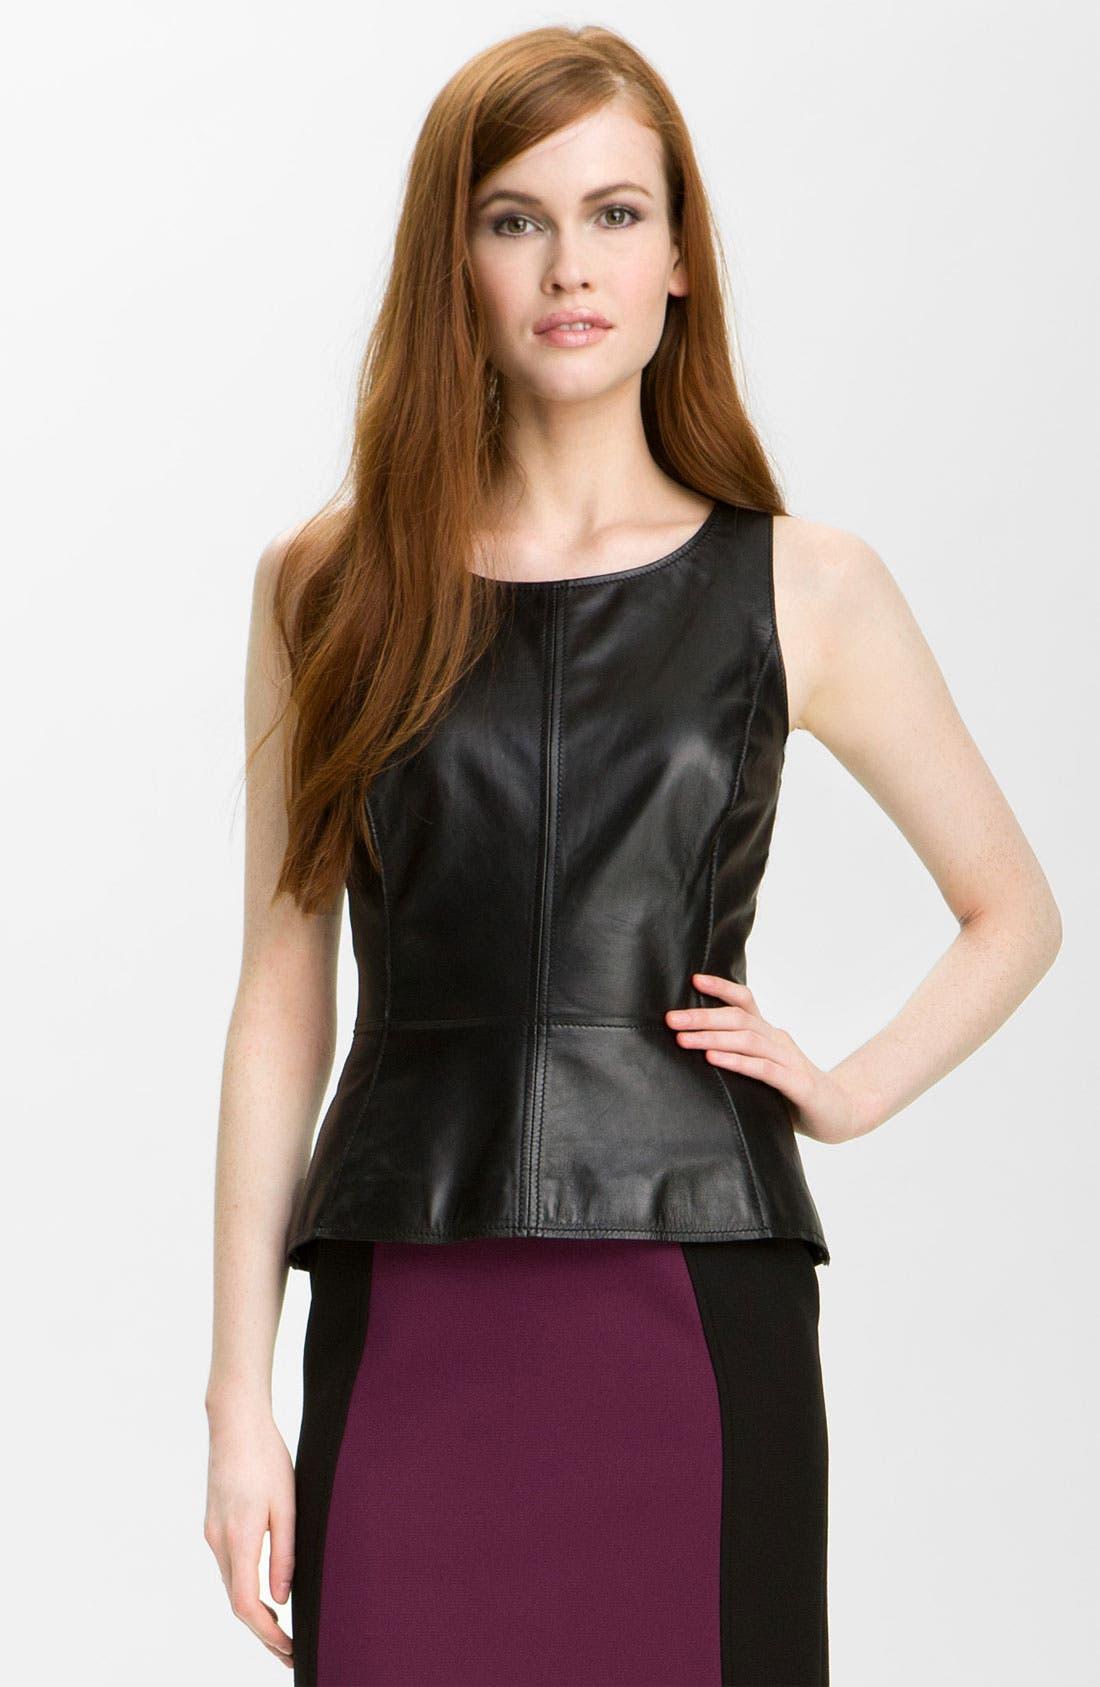 Alternate Image 1 Selected - Halogen® Leather Top & Pencil Skirt